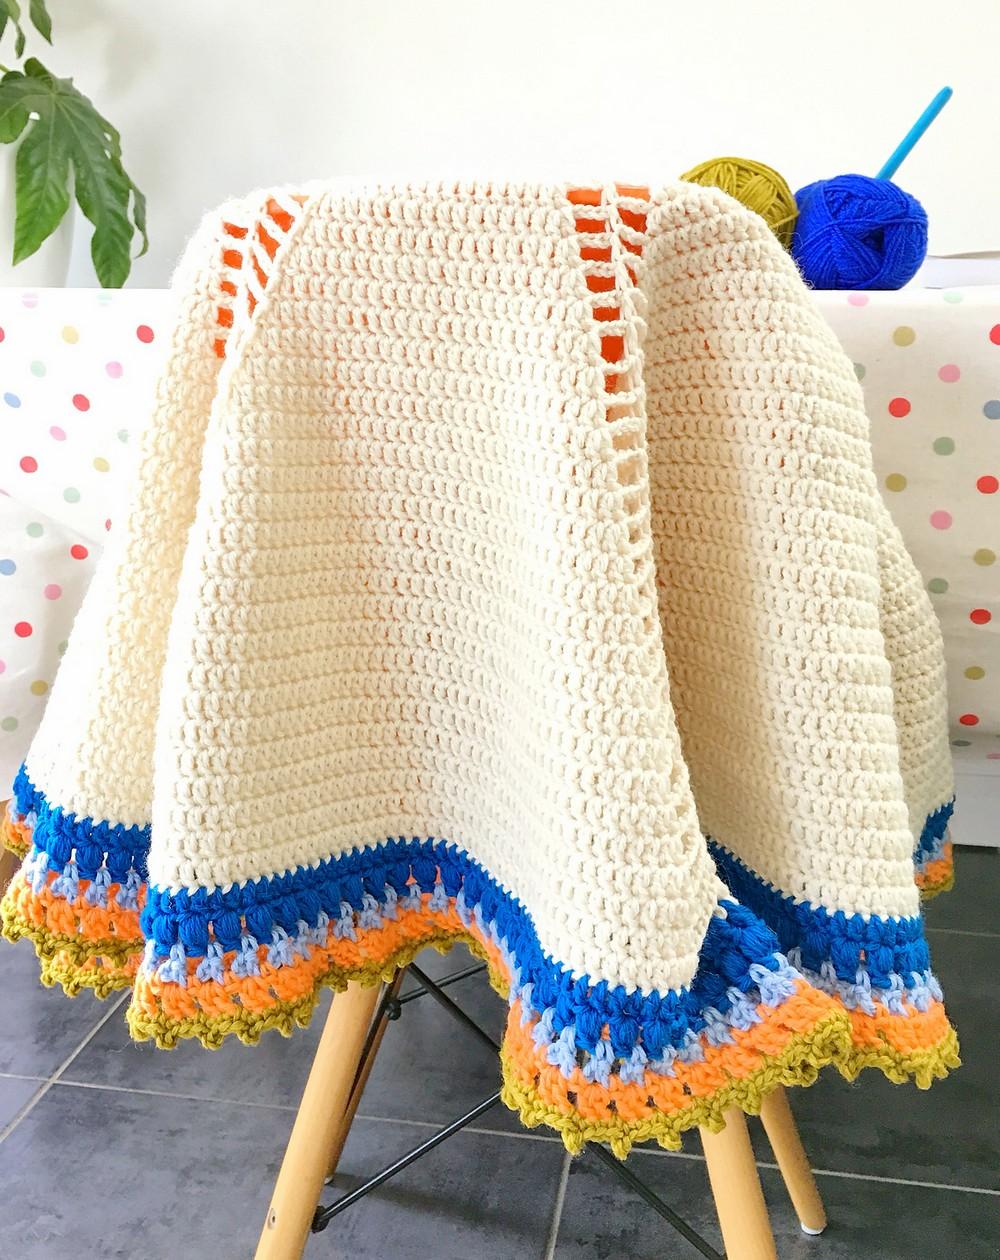 Circular Free Crochet Blanket With Motif Pattern